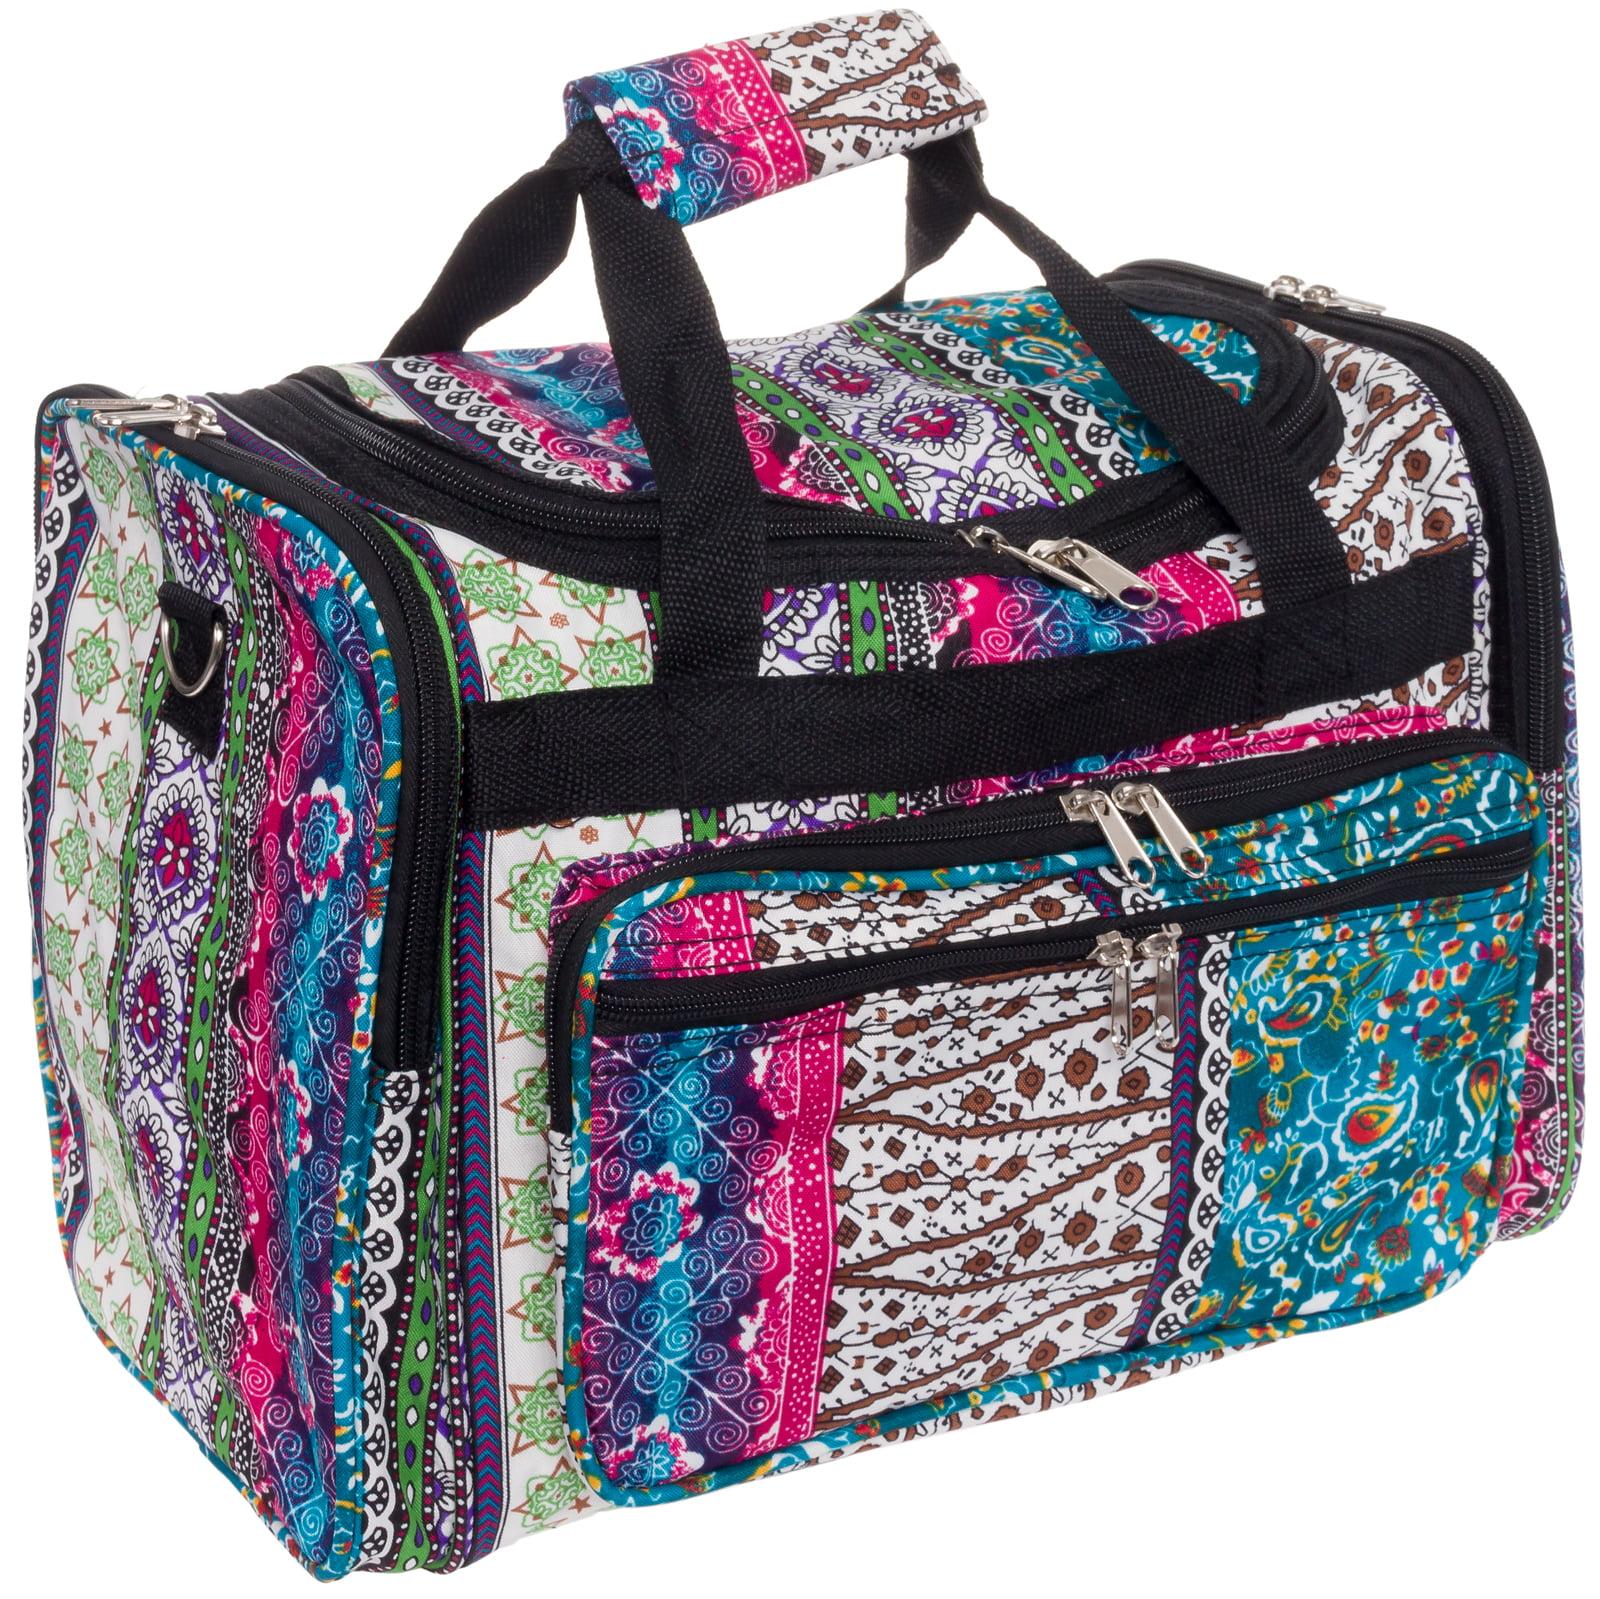 "SILVERHOOKS New Bohemian 16"" Inch Duffel Carry-On Travel Gym Bag w  Black Trim by Gen SH"